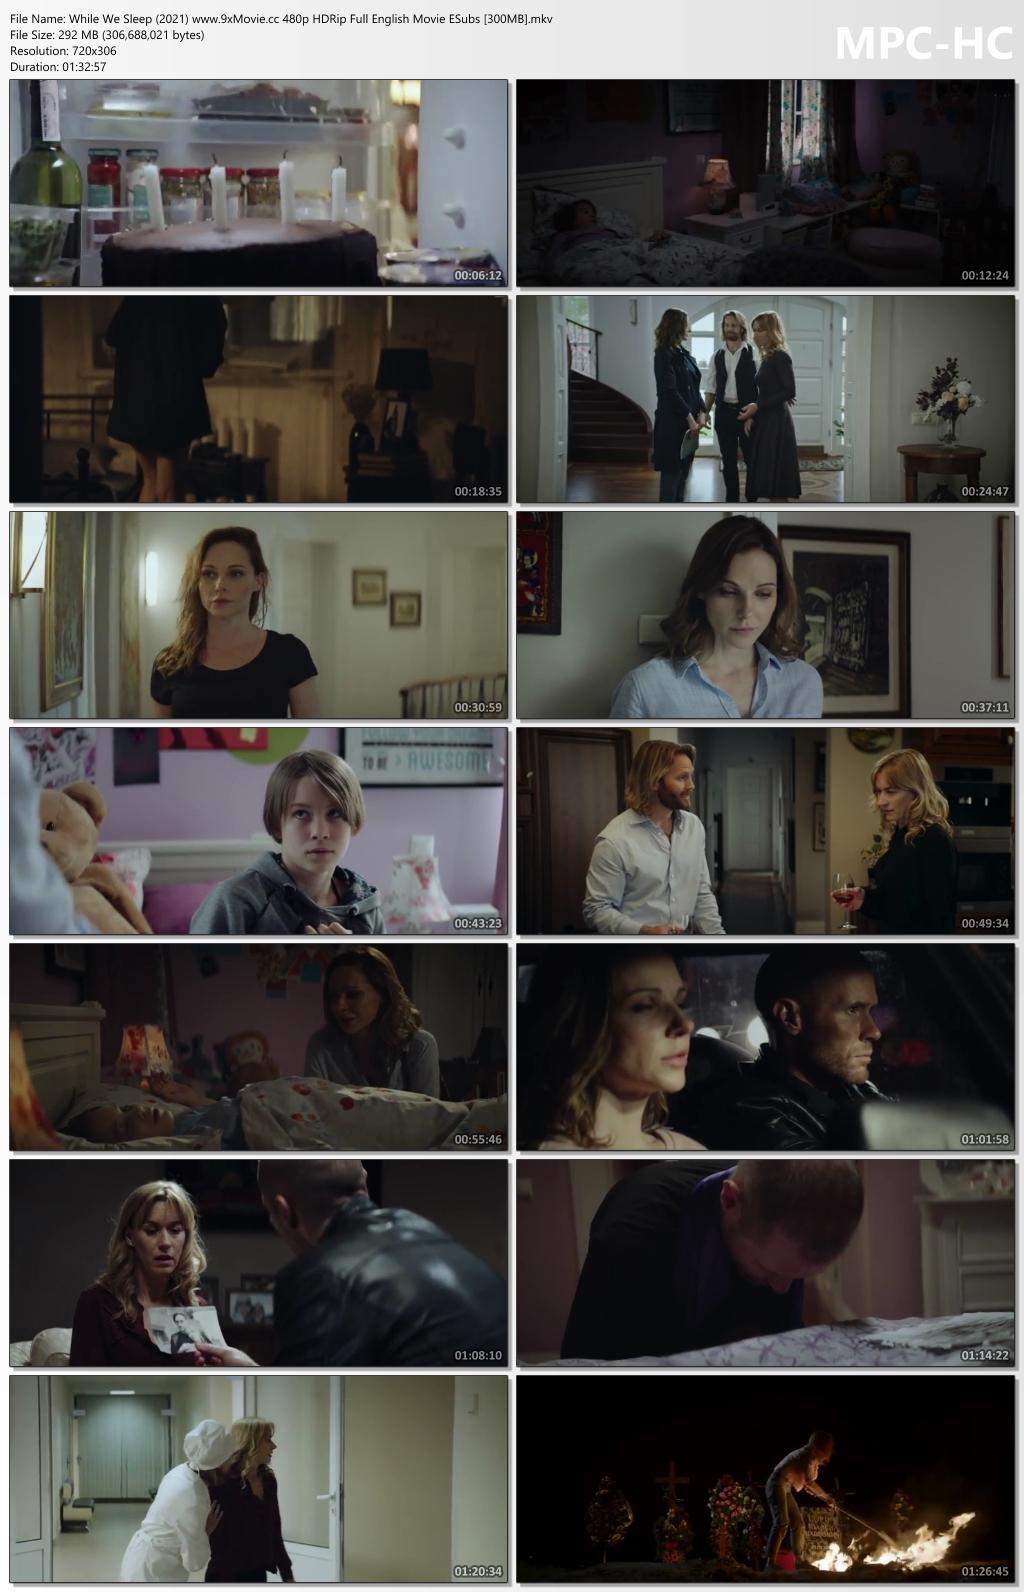 While-We-Sleep-2021-www-9x-Movie-cc-480p-HDRip-Full-English-Movie-ESubs-300-MB-mkv